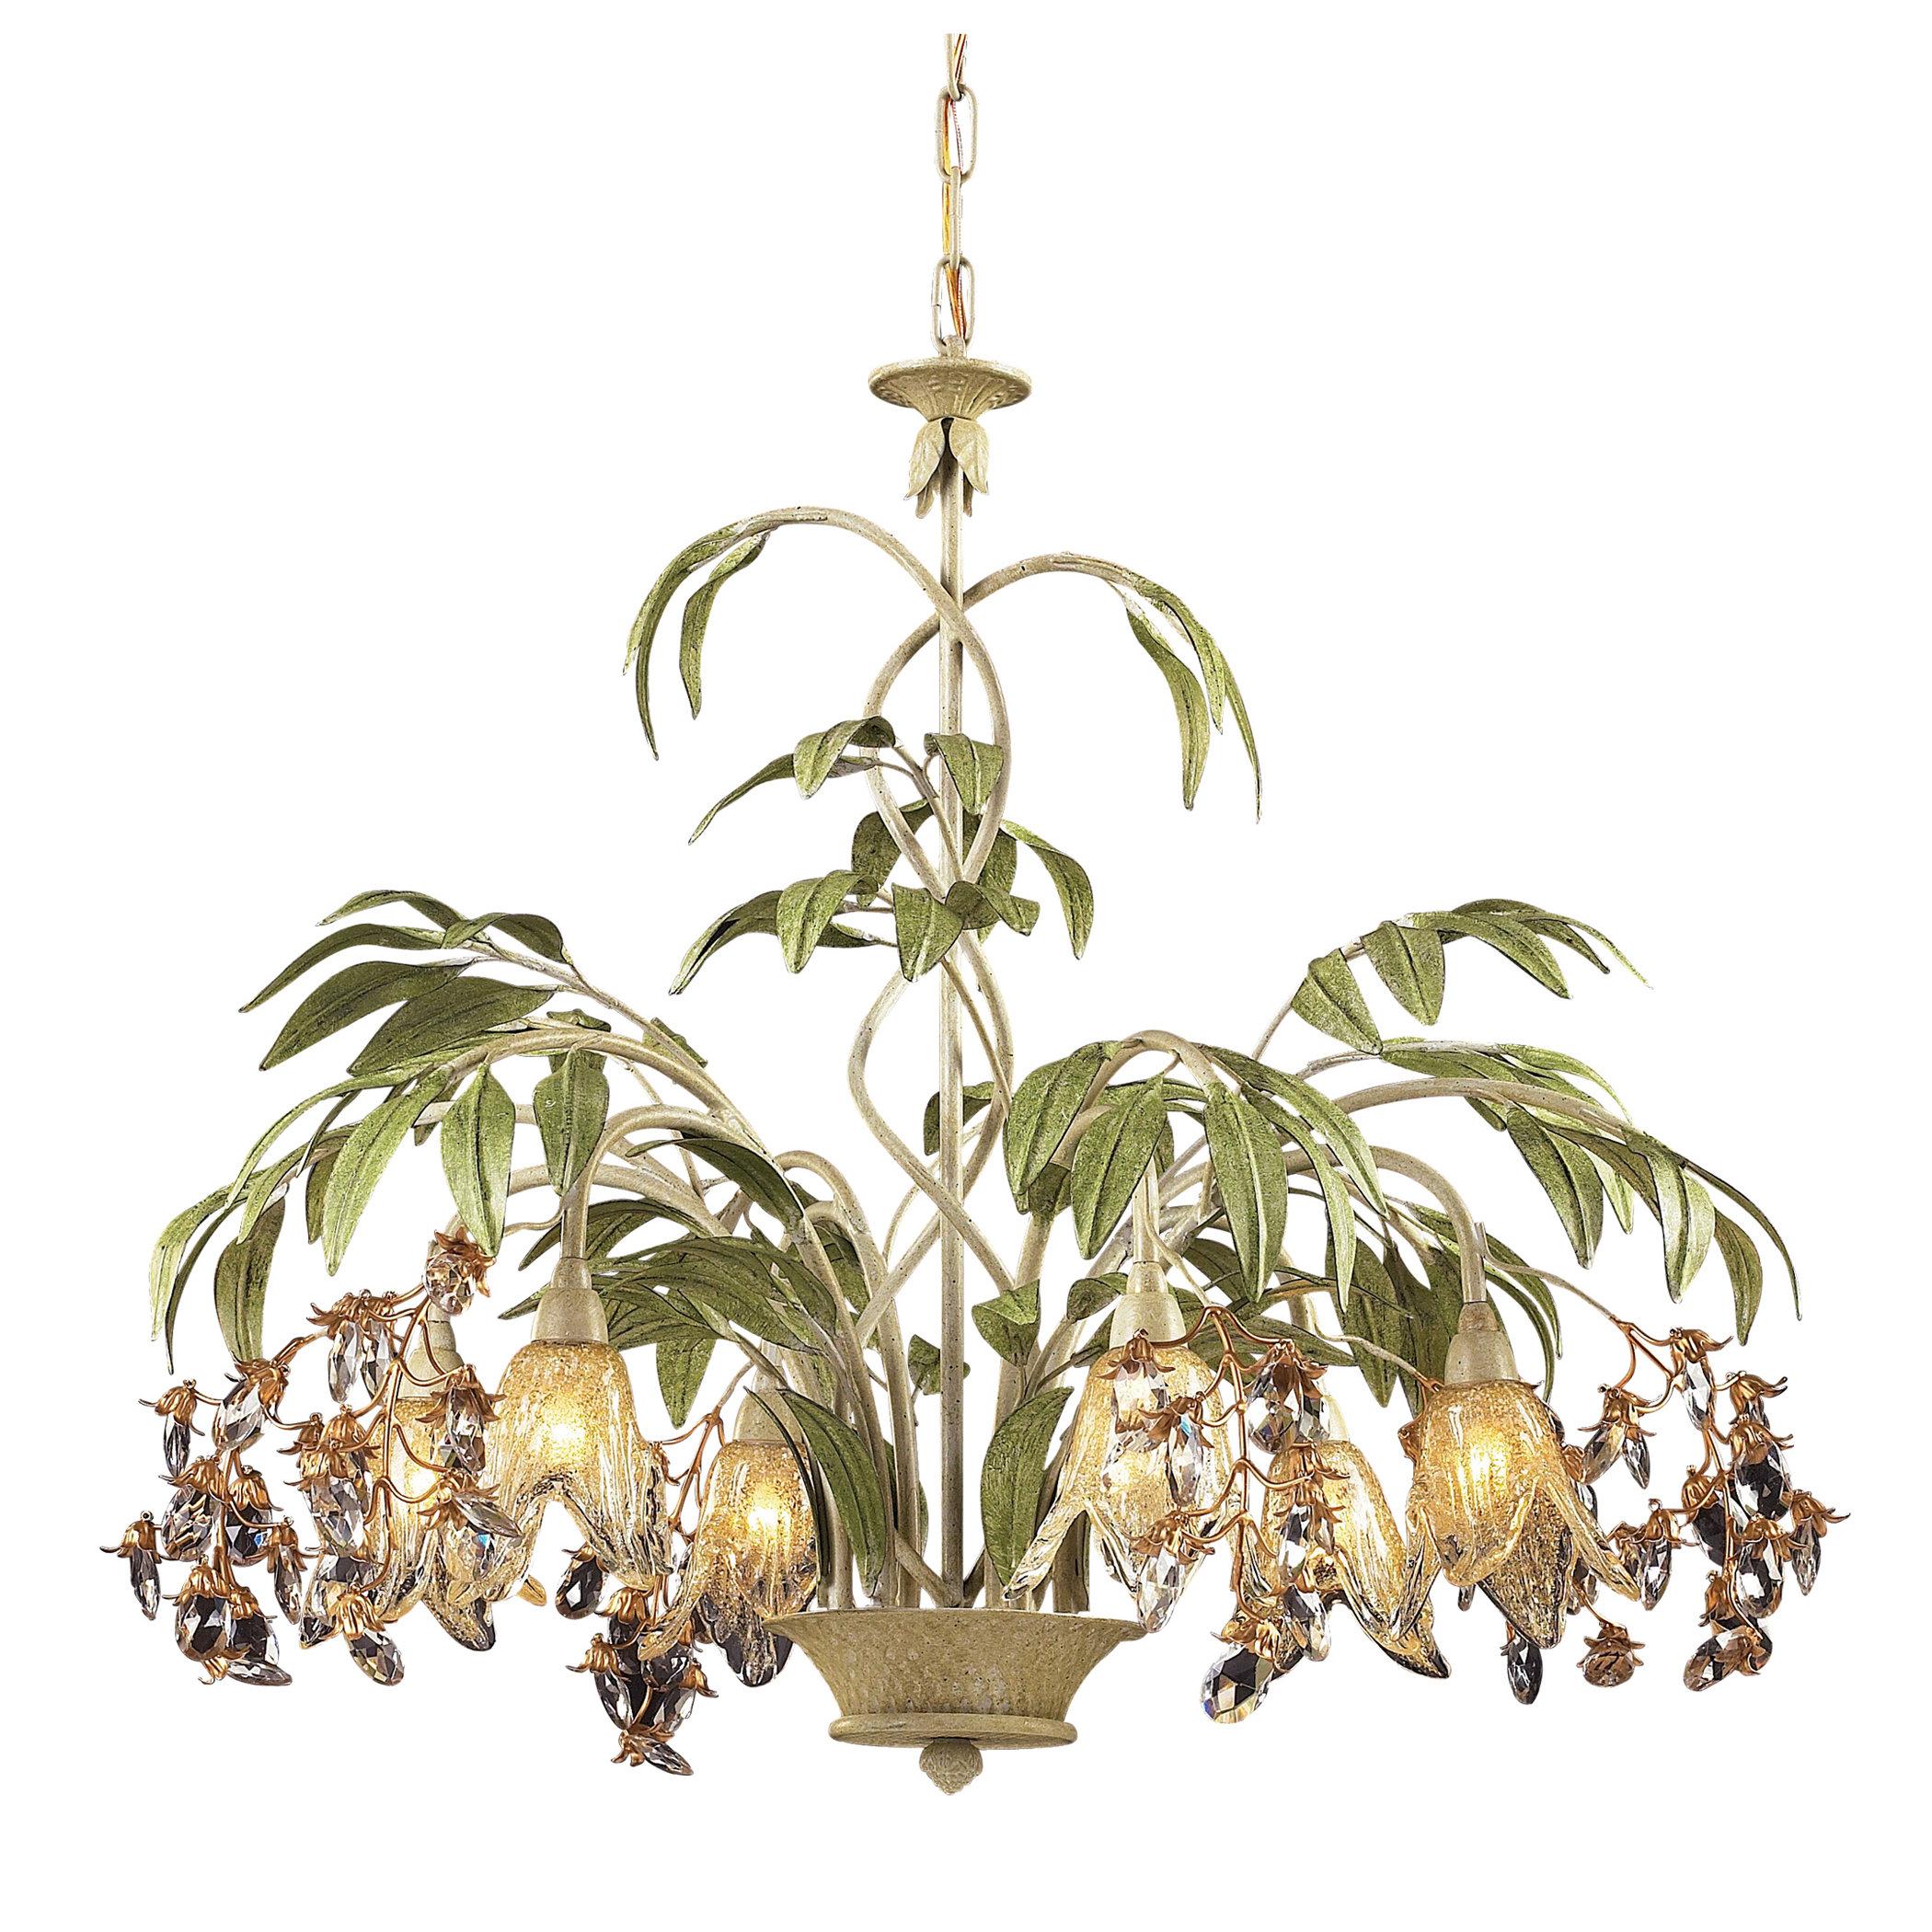 pearson htm twelve black iron lighting sale chandeliers vine chandelier bellacor on light